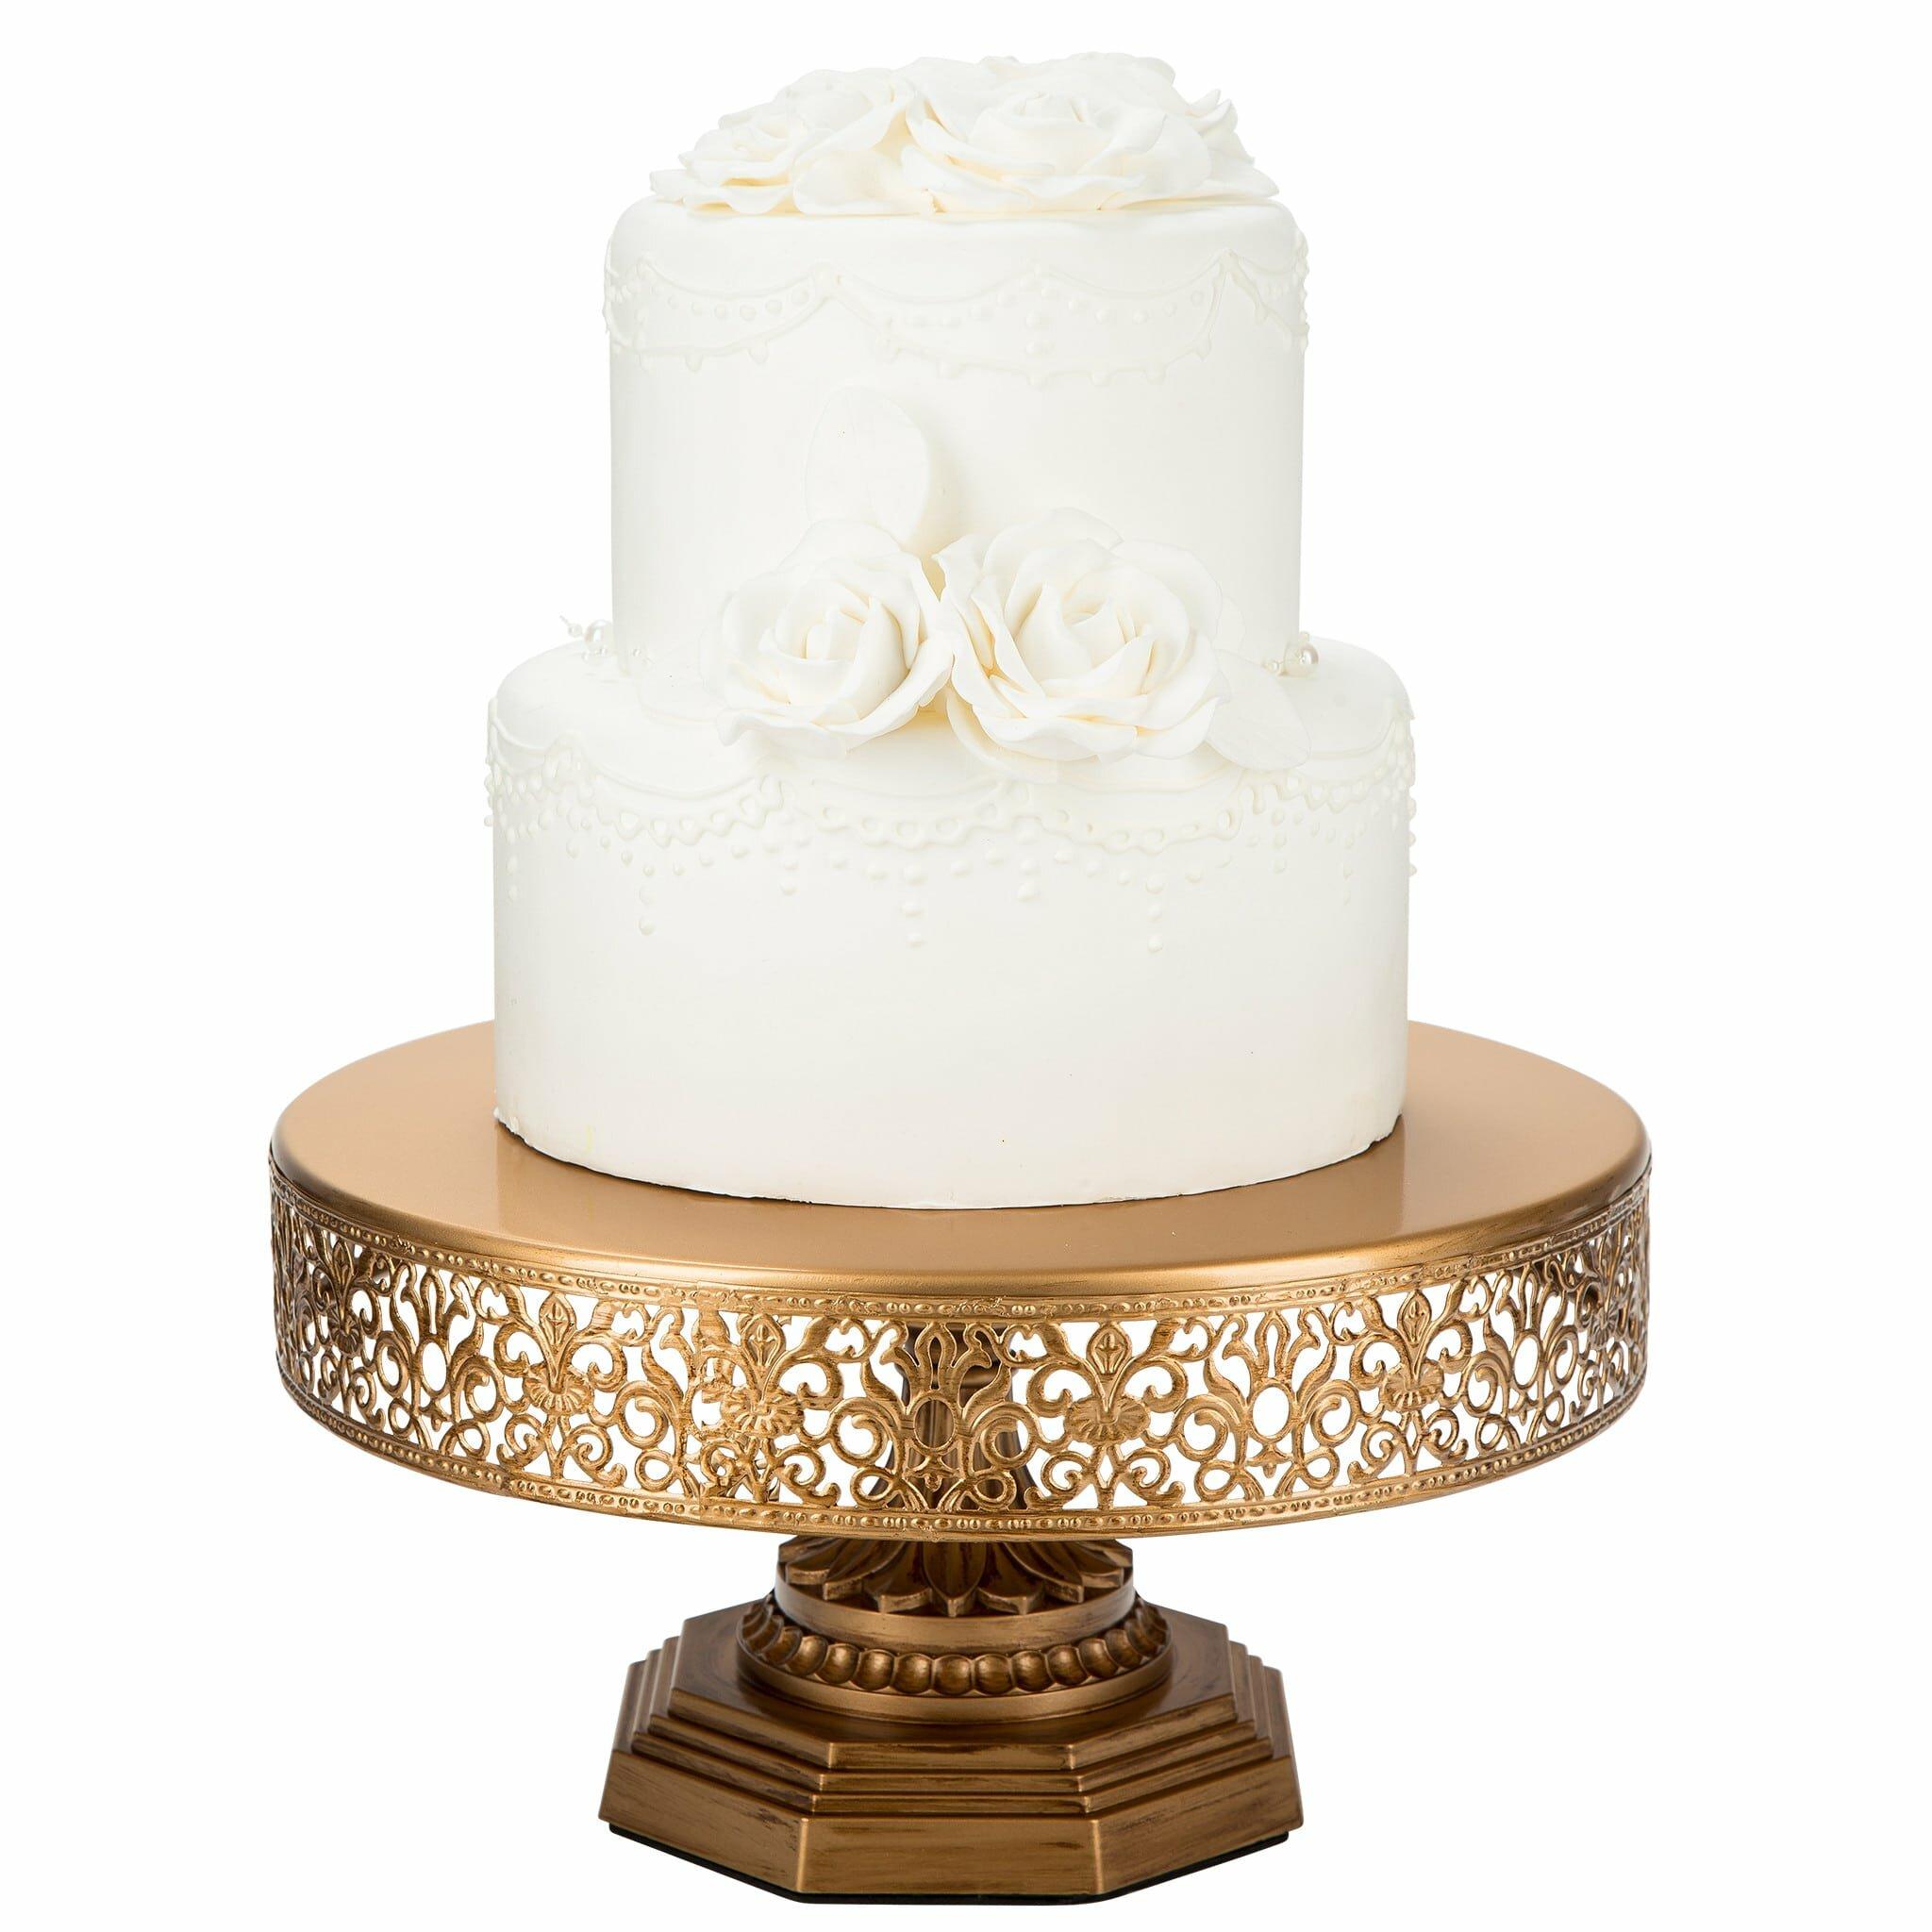 Decorative Cake Stands Amalfidecor Victoria Metal Cake Stand Reviews Wayfair